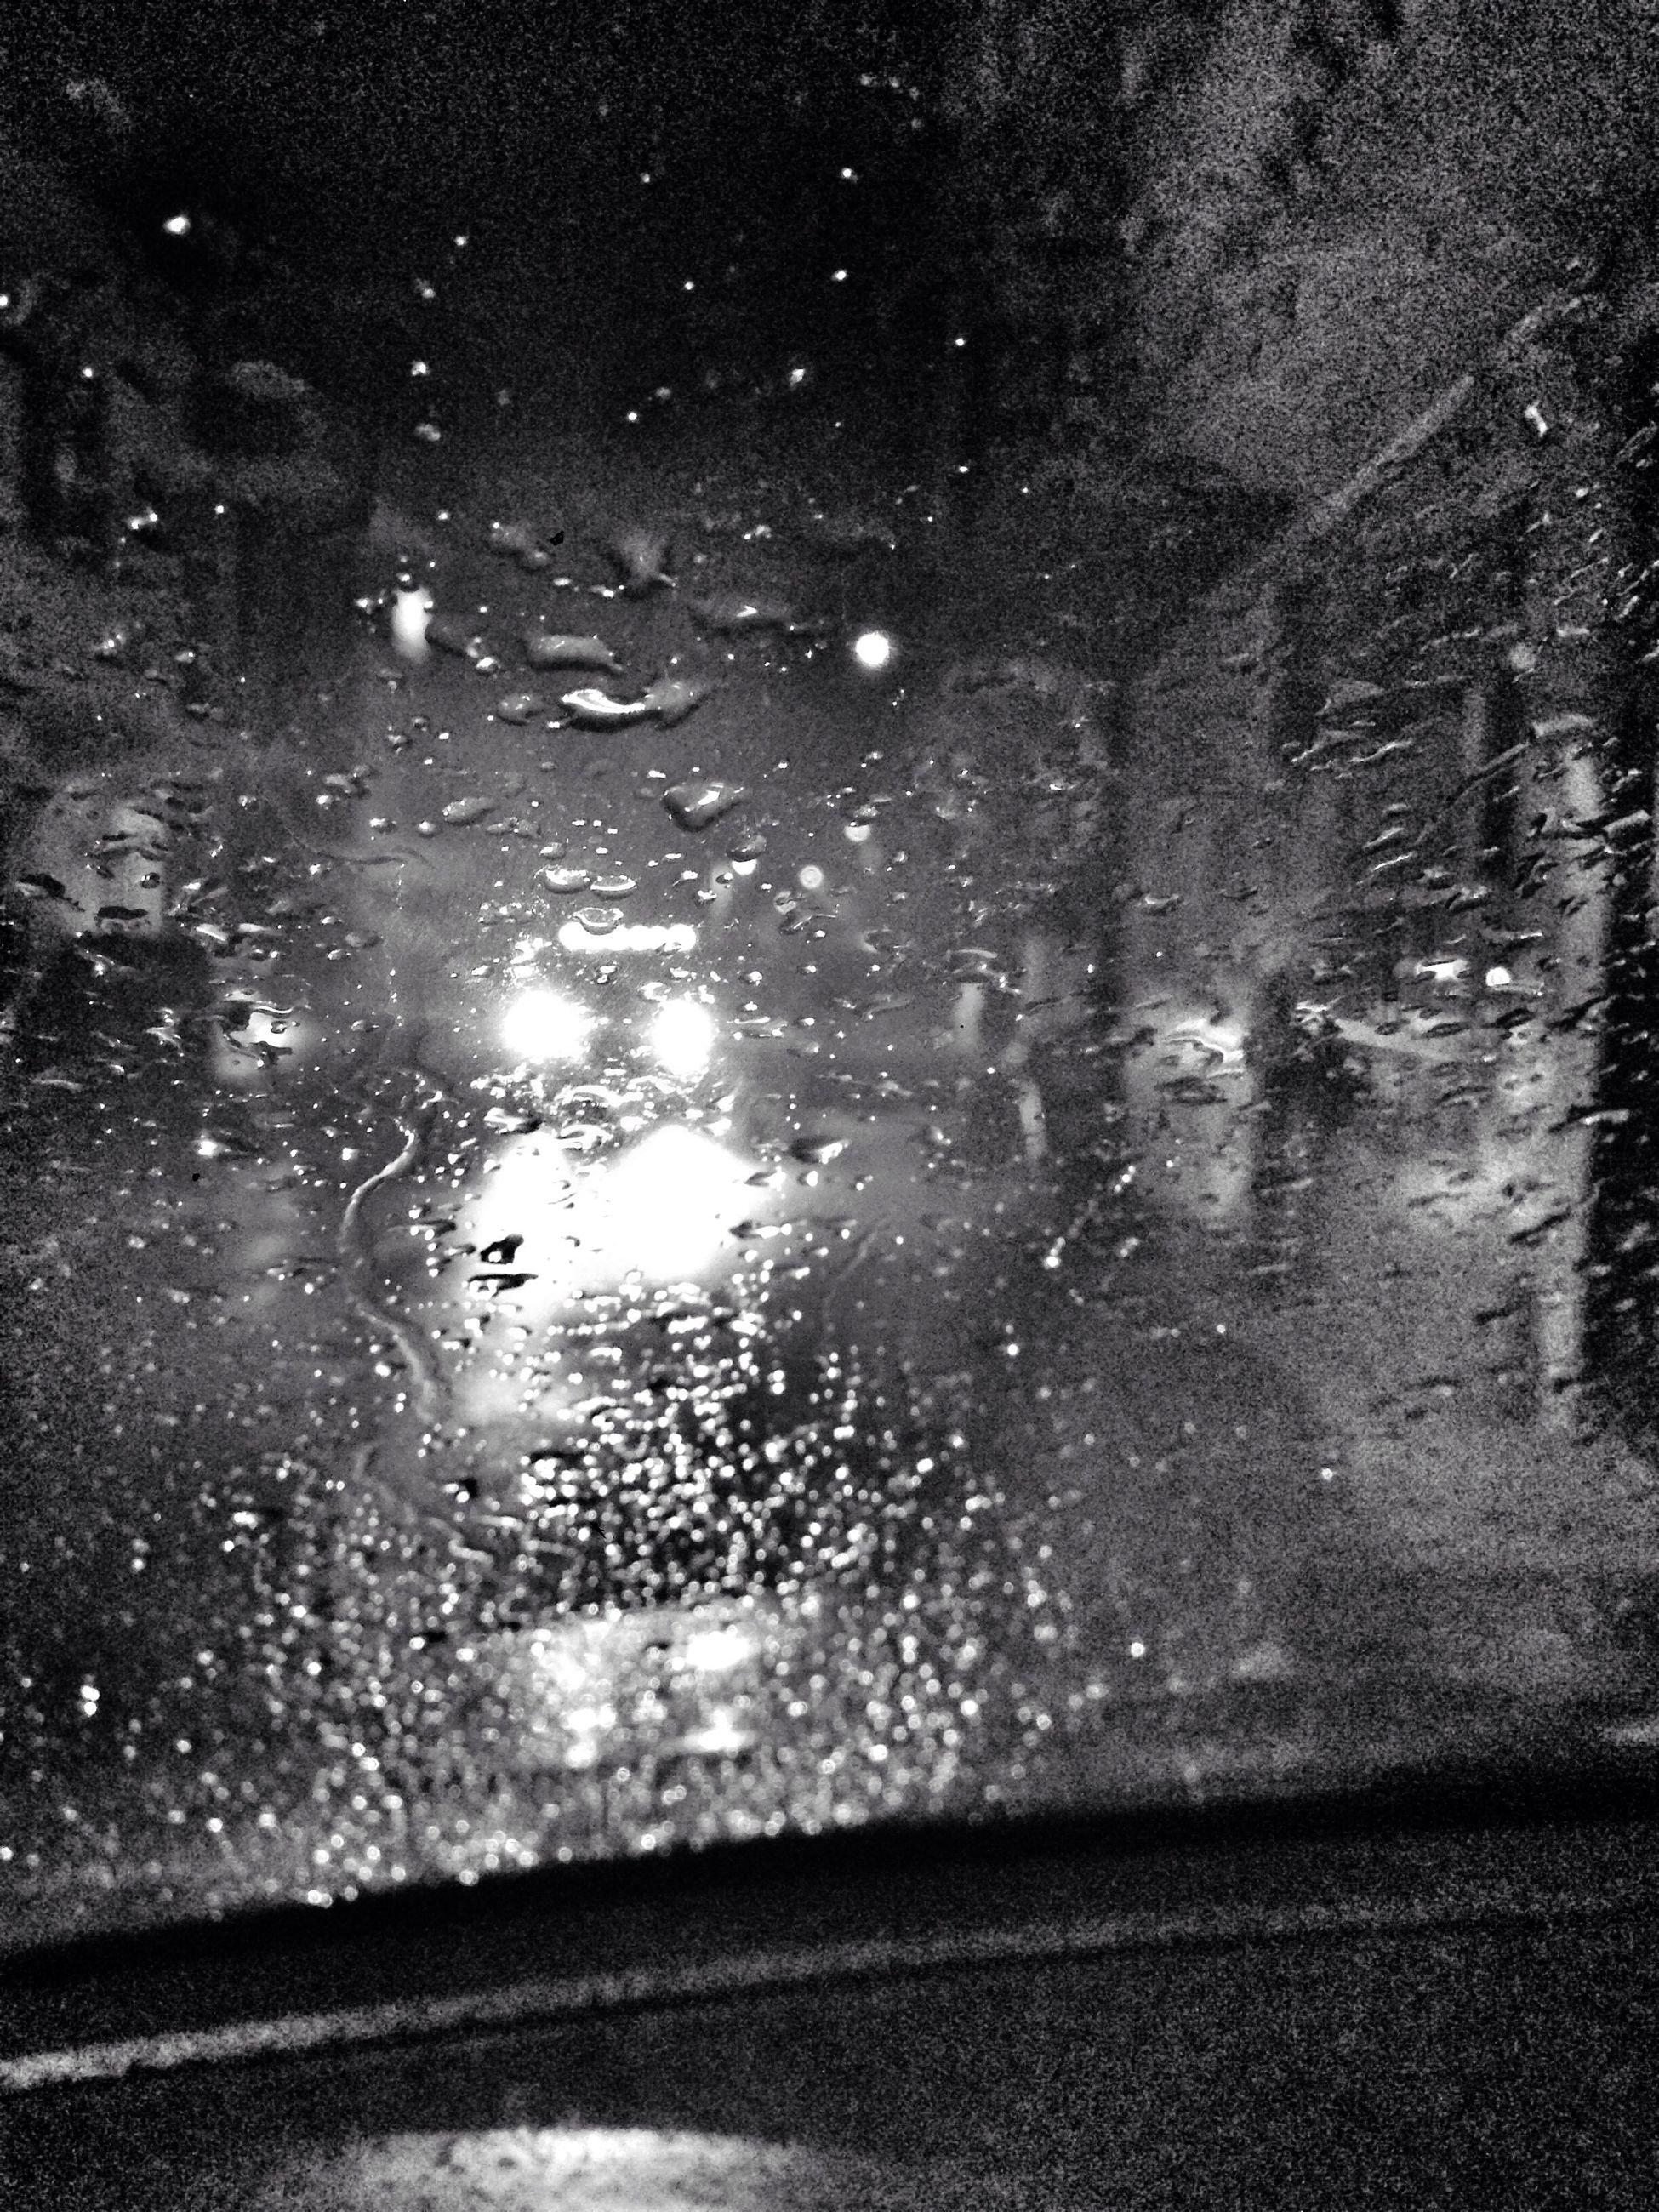 window, water, drop, wet, rain, season, weather, transparent, glass - material, full frame, nature, no people, rainy